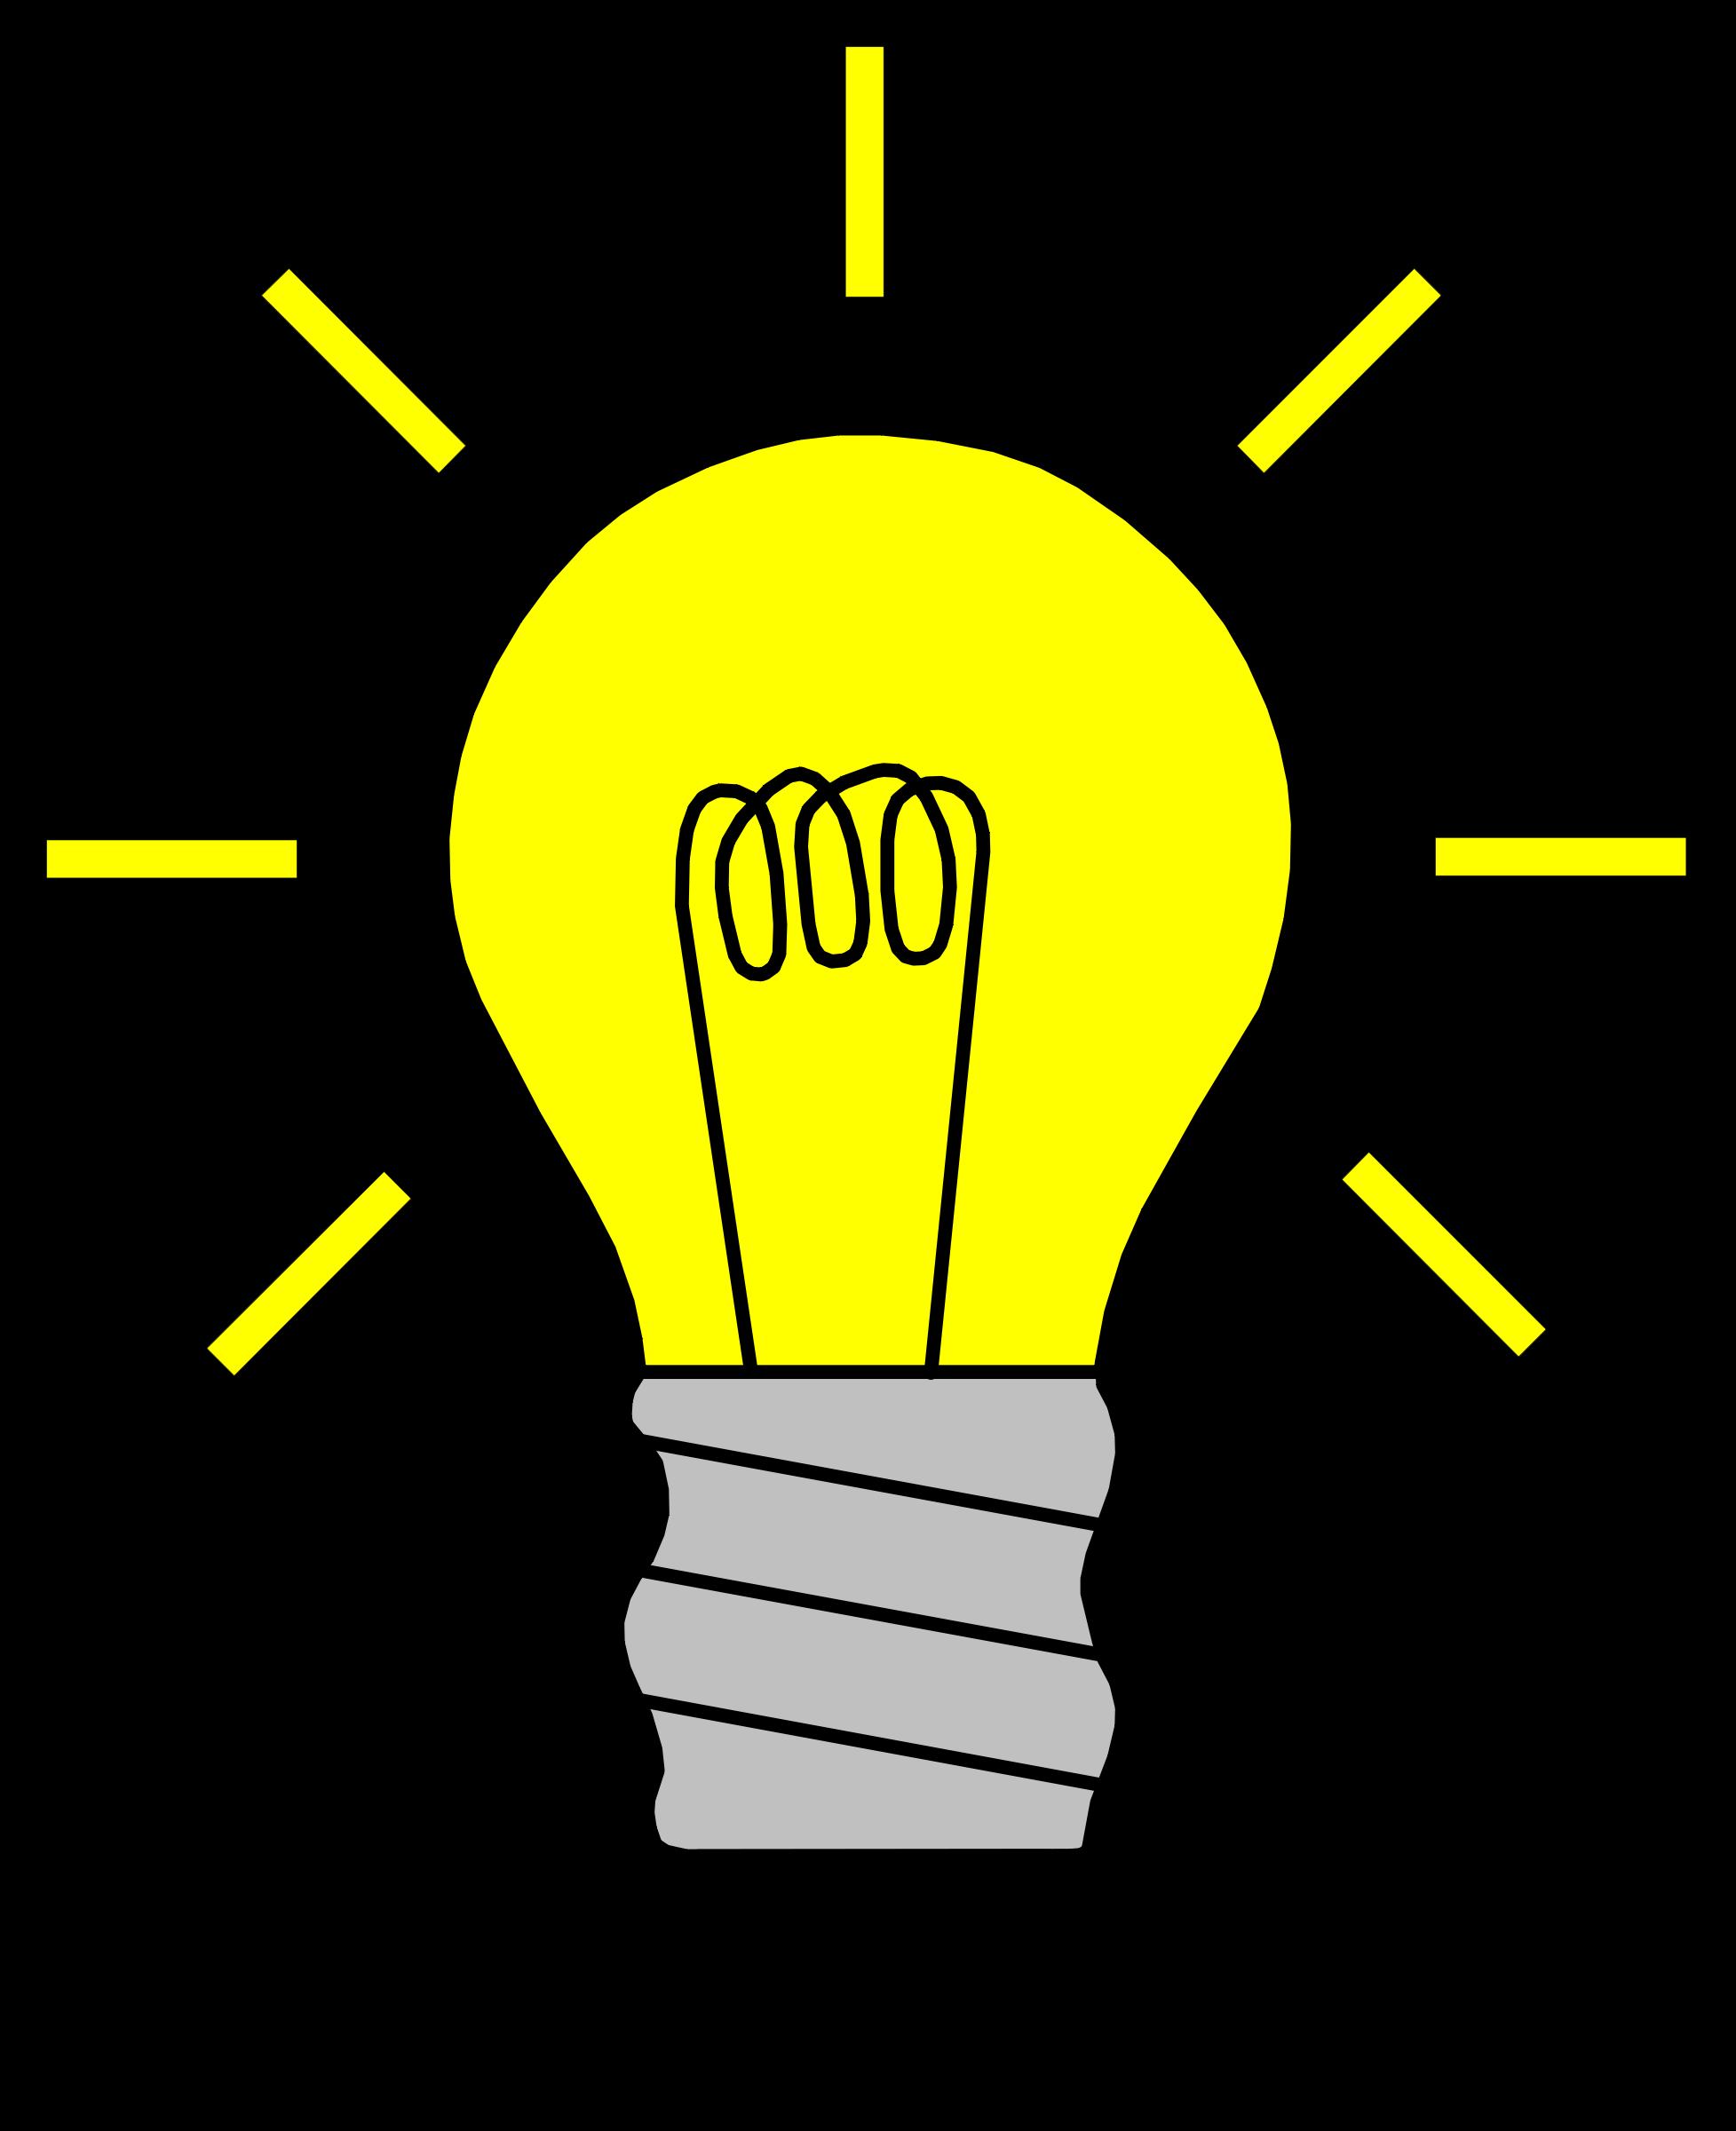 Light Bulb Clip Art BULB02 image #836